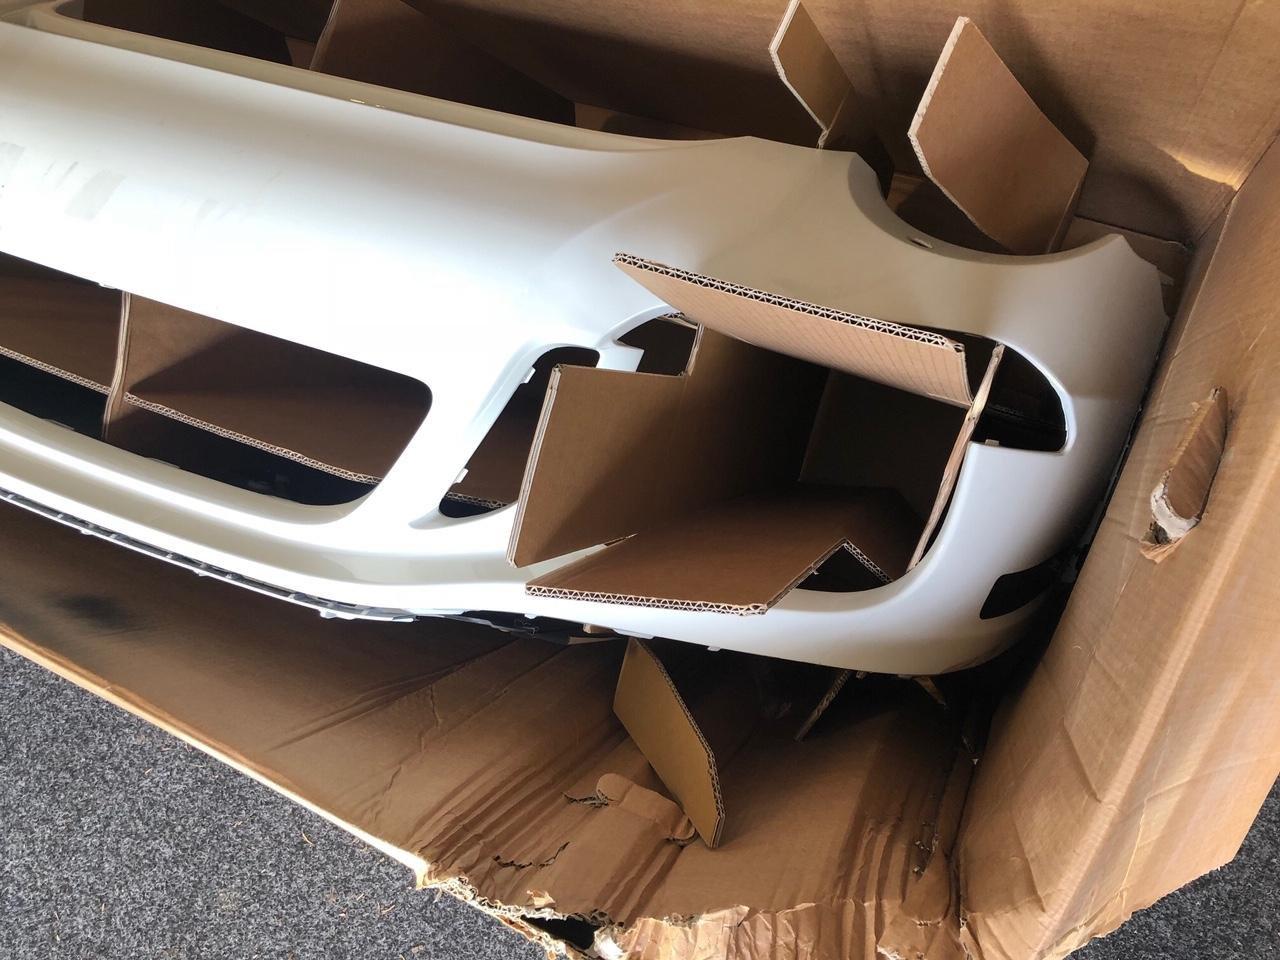 2015 Porsche 991 GT3 RS Gen 1 Front Bumper Cover For Sale (picture 2 of 4)